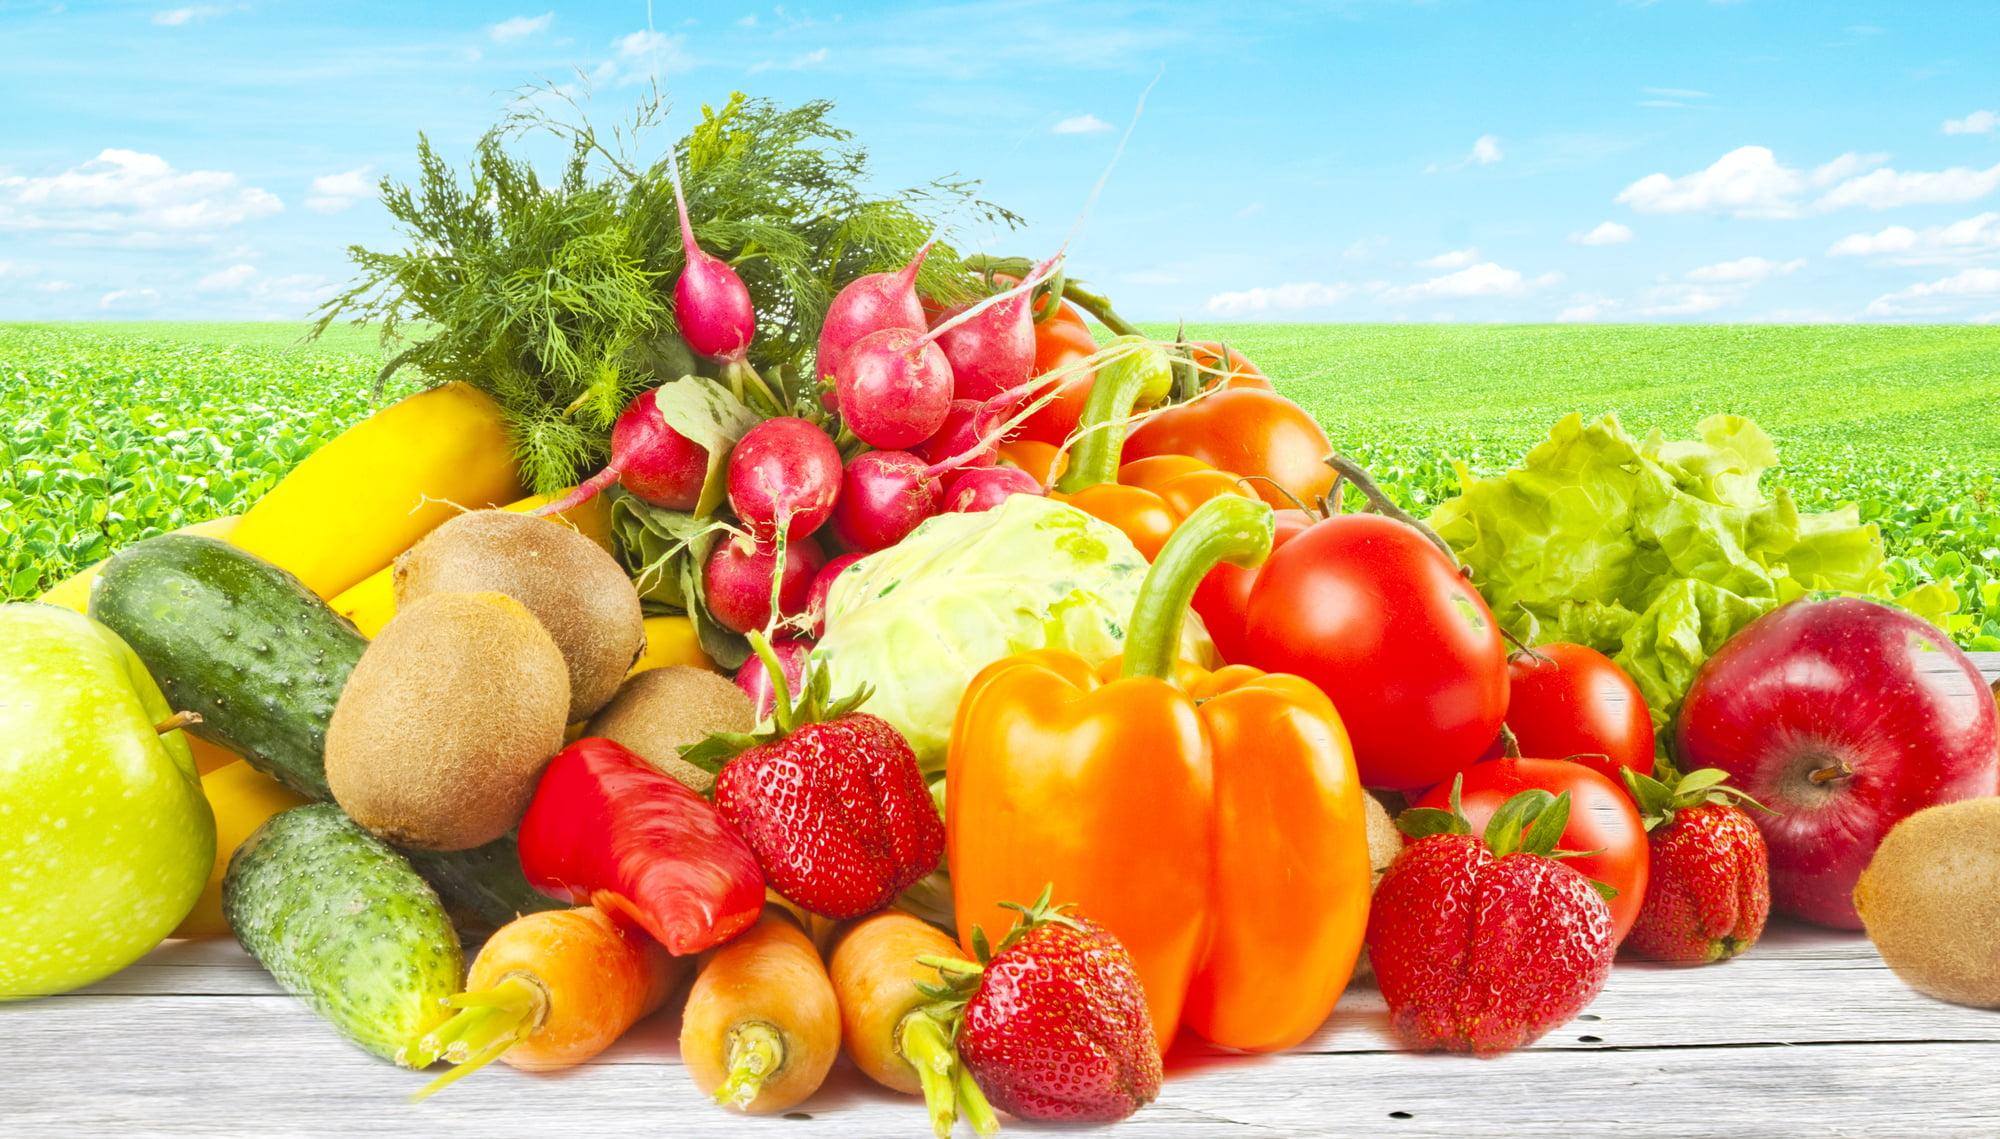 9 Types of Organic Foods